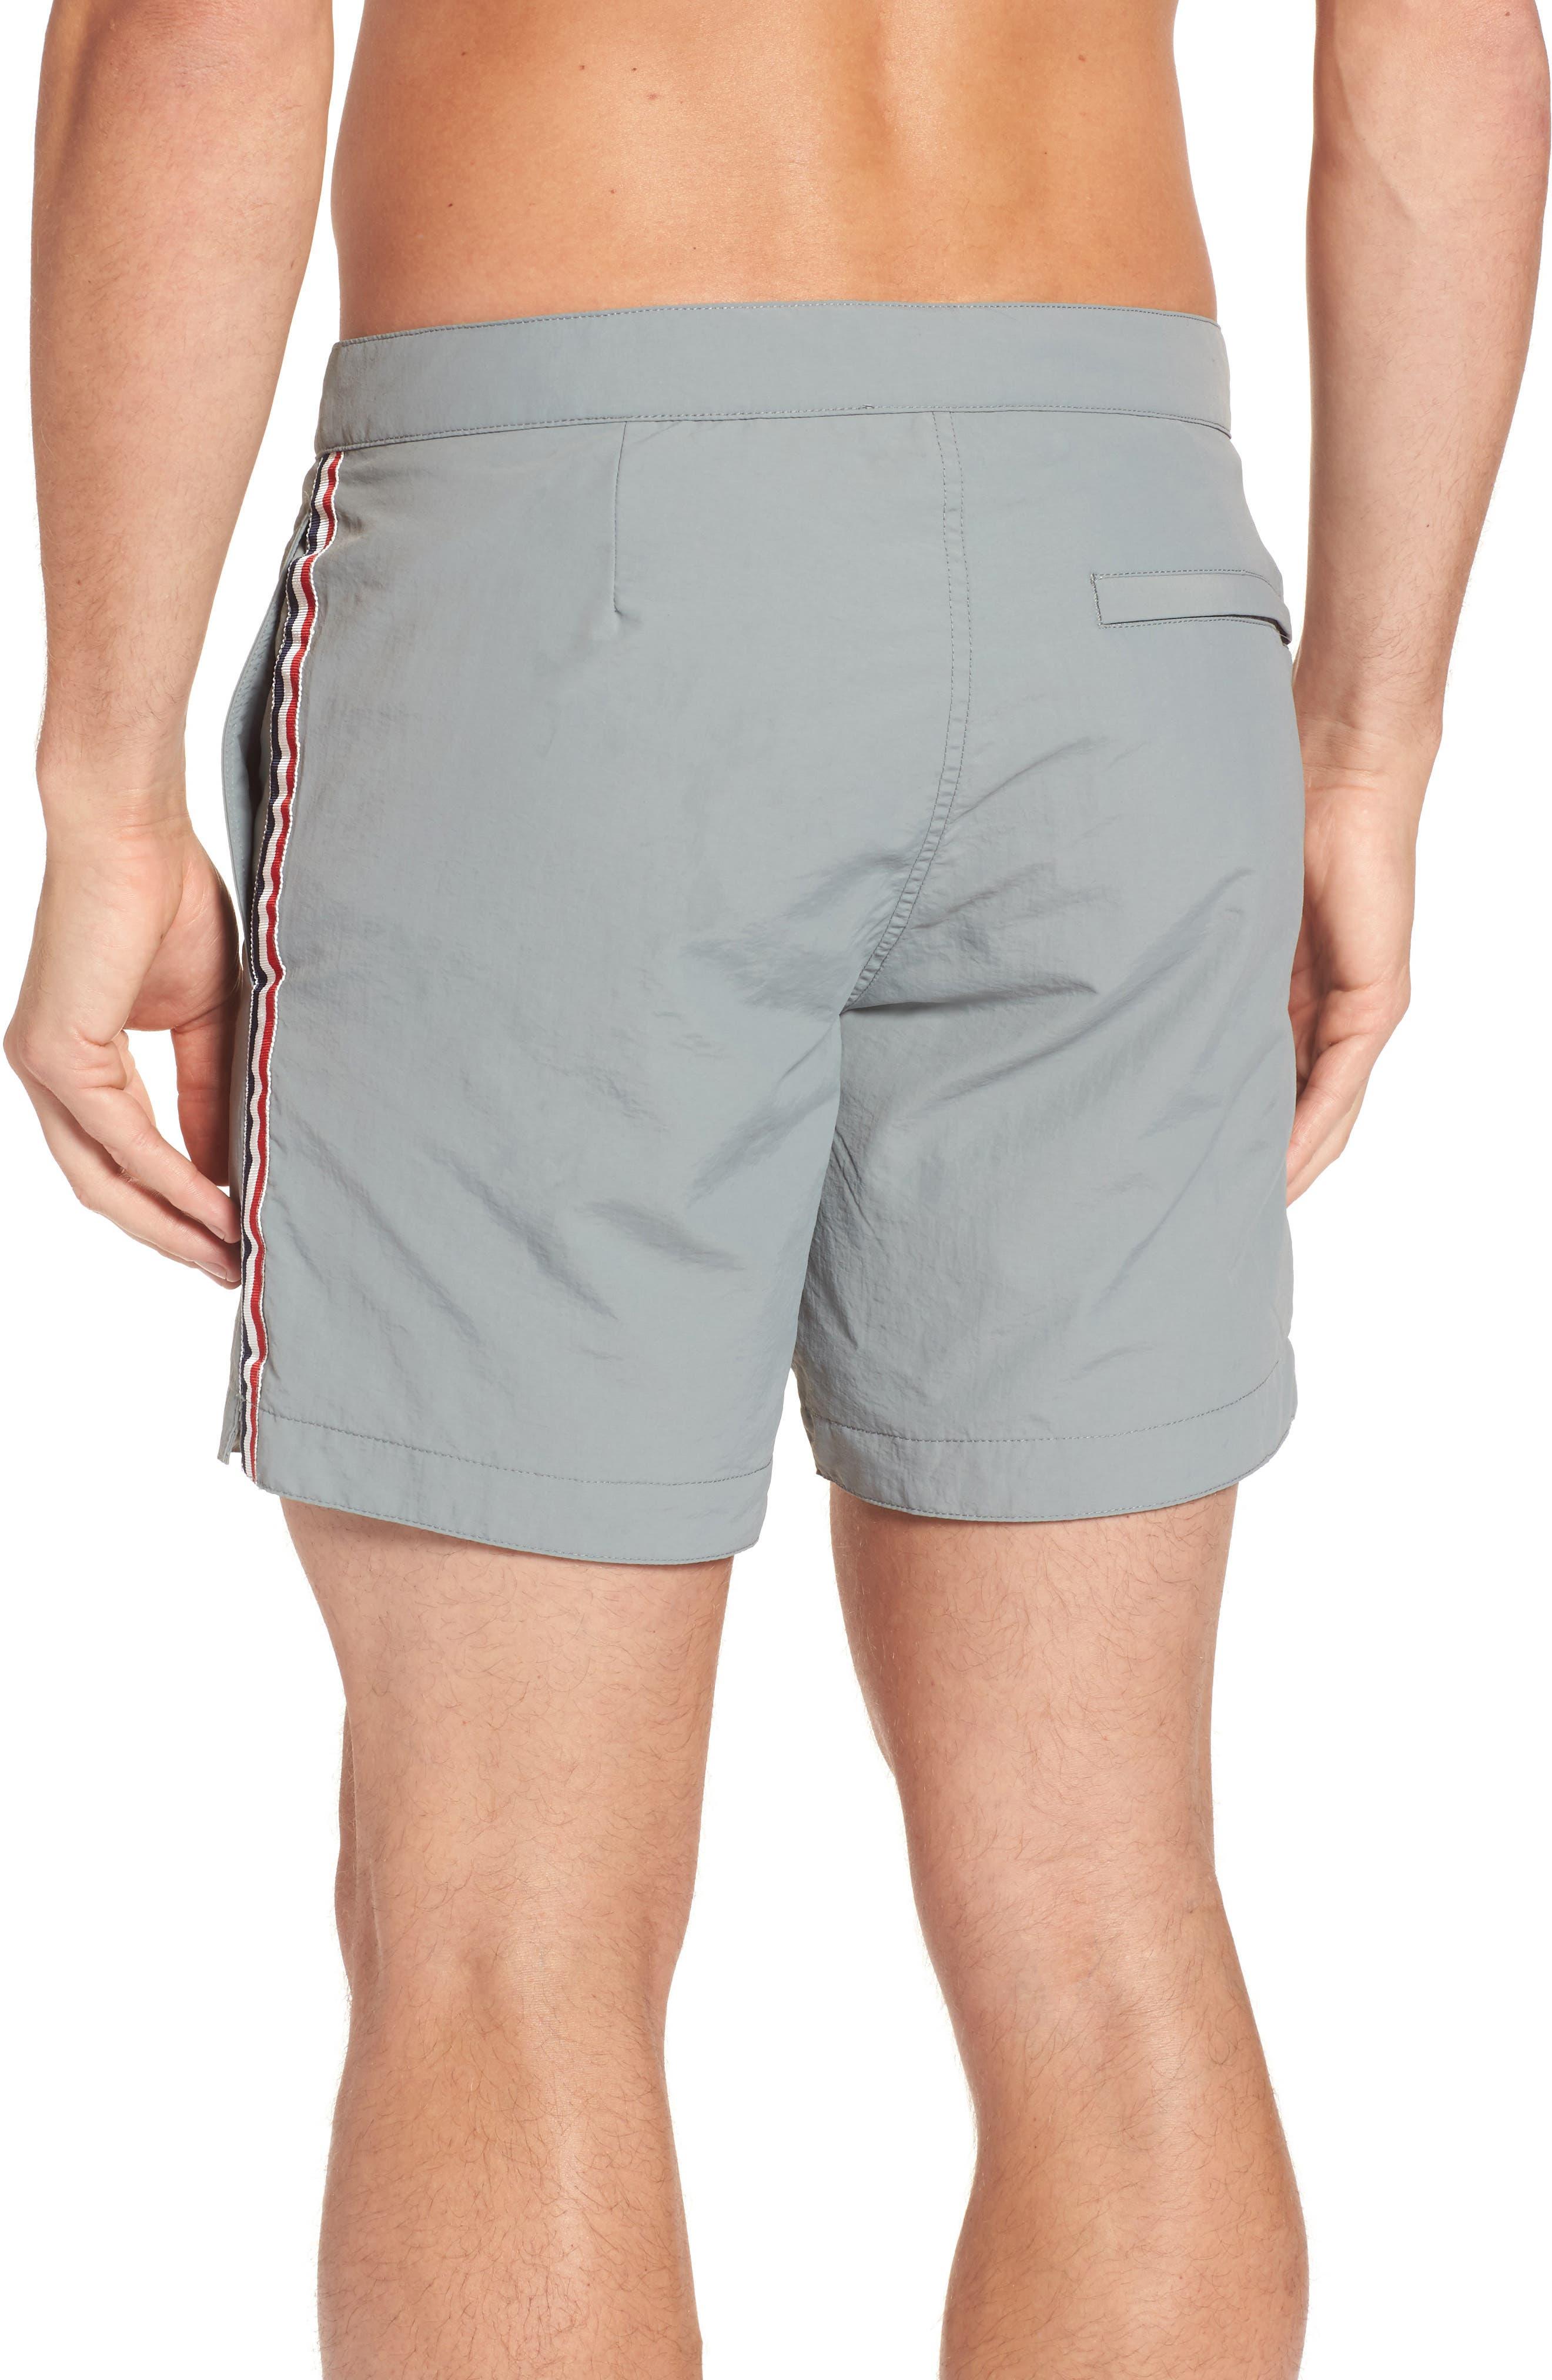 Aruba Tailored Fit French Stripe Swim Trunks,                             Alternate thumbnail 3, color,